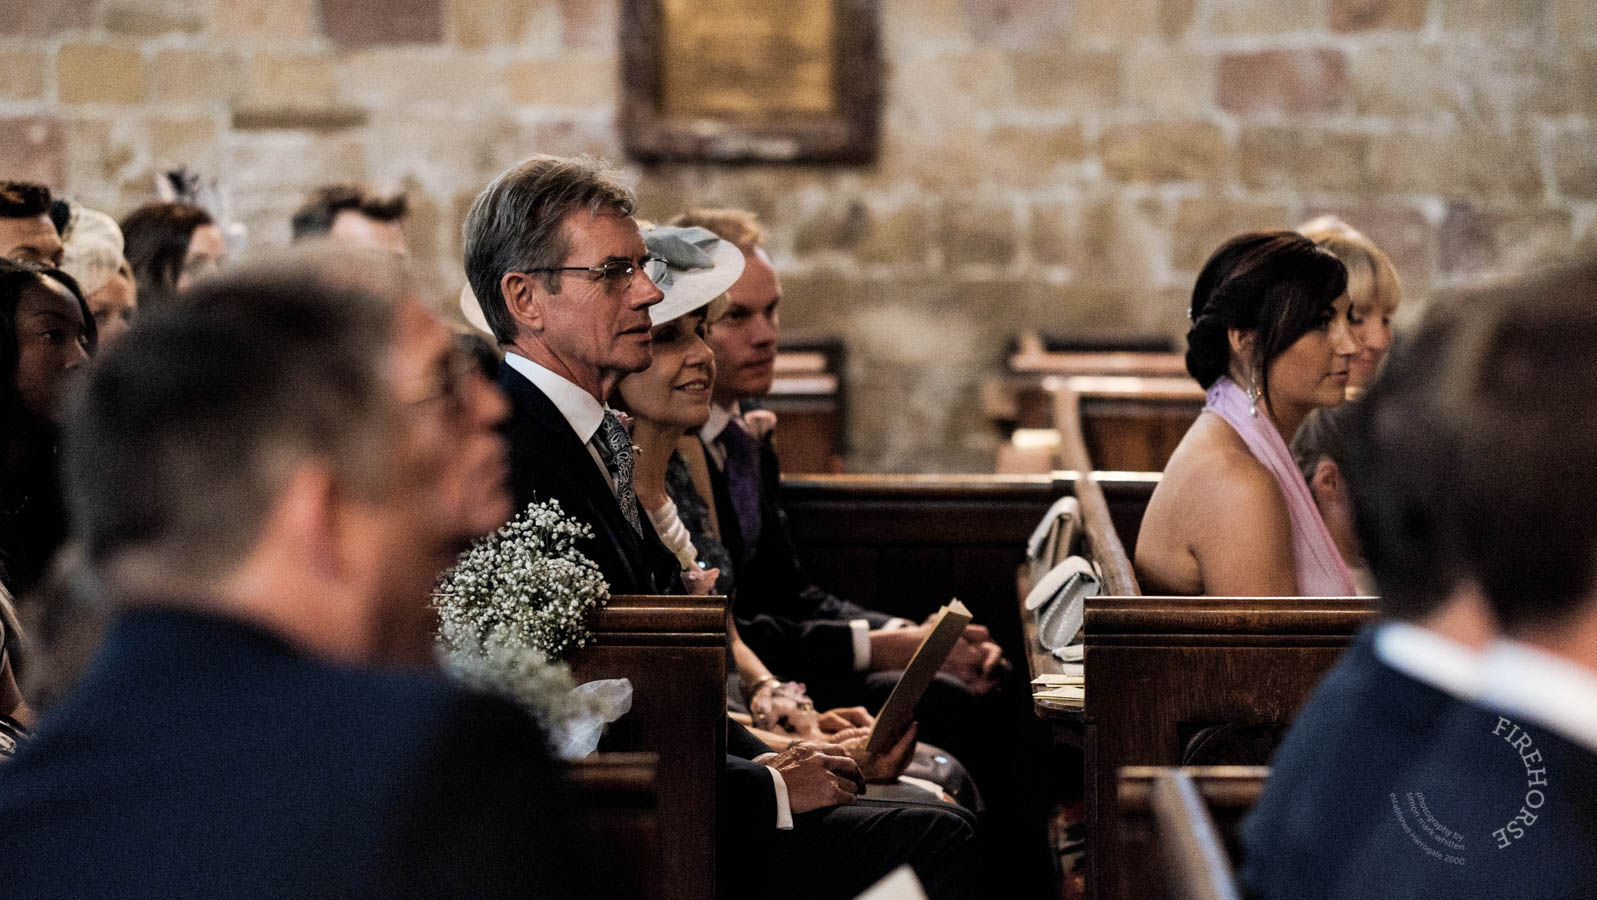 Harrogate-Wedding-084